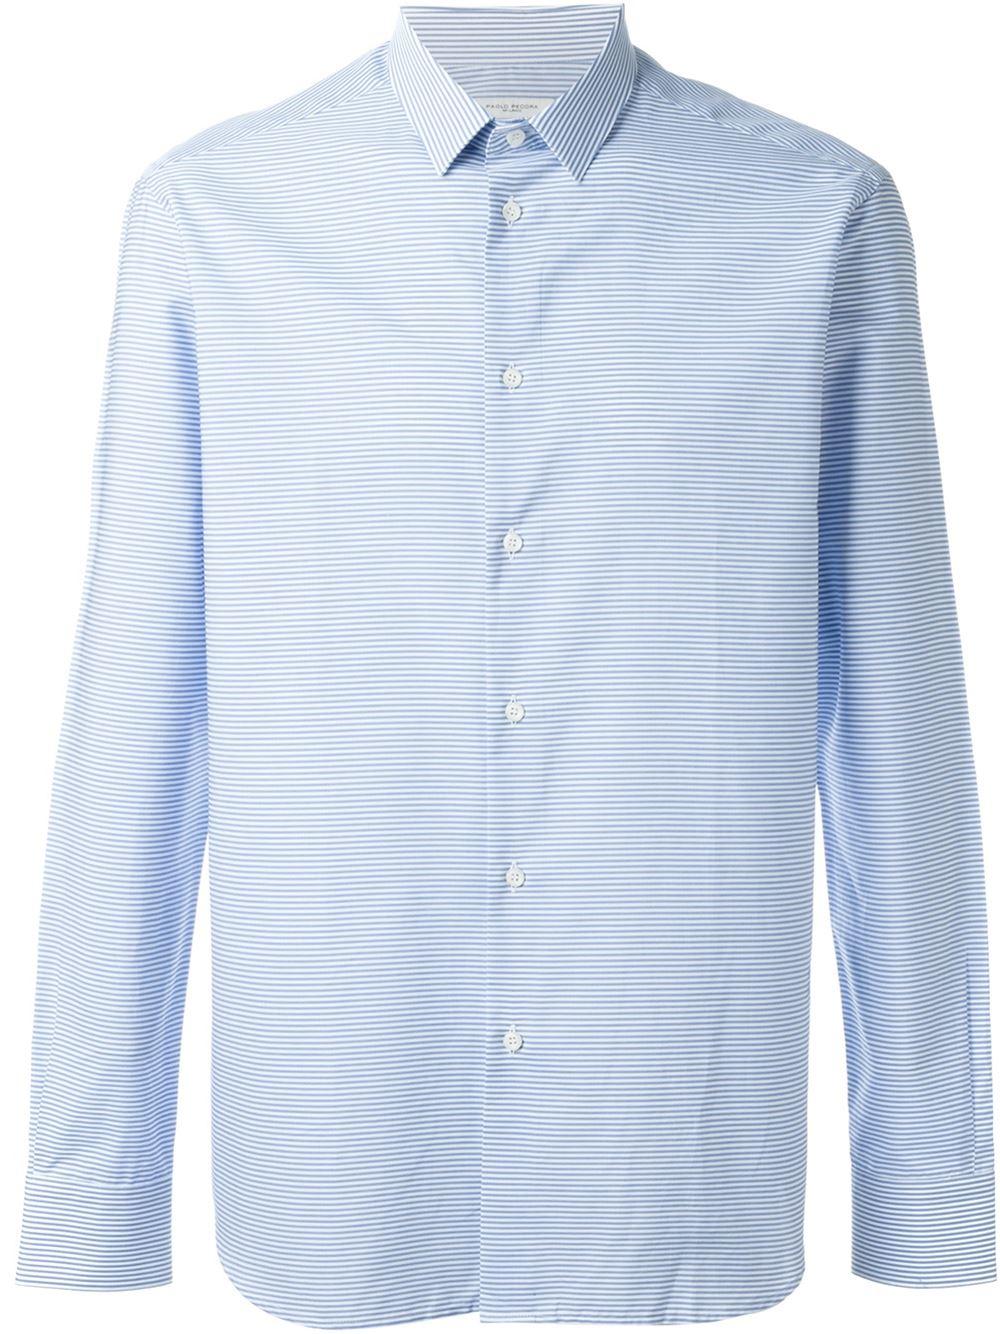 Paolo pecora striped button down shirt in white for men lyst for Striped button down shirts for men